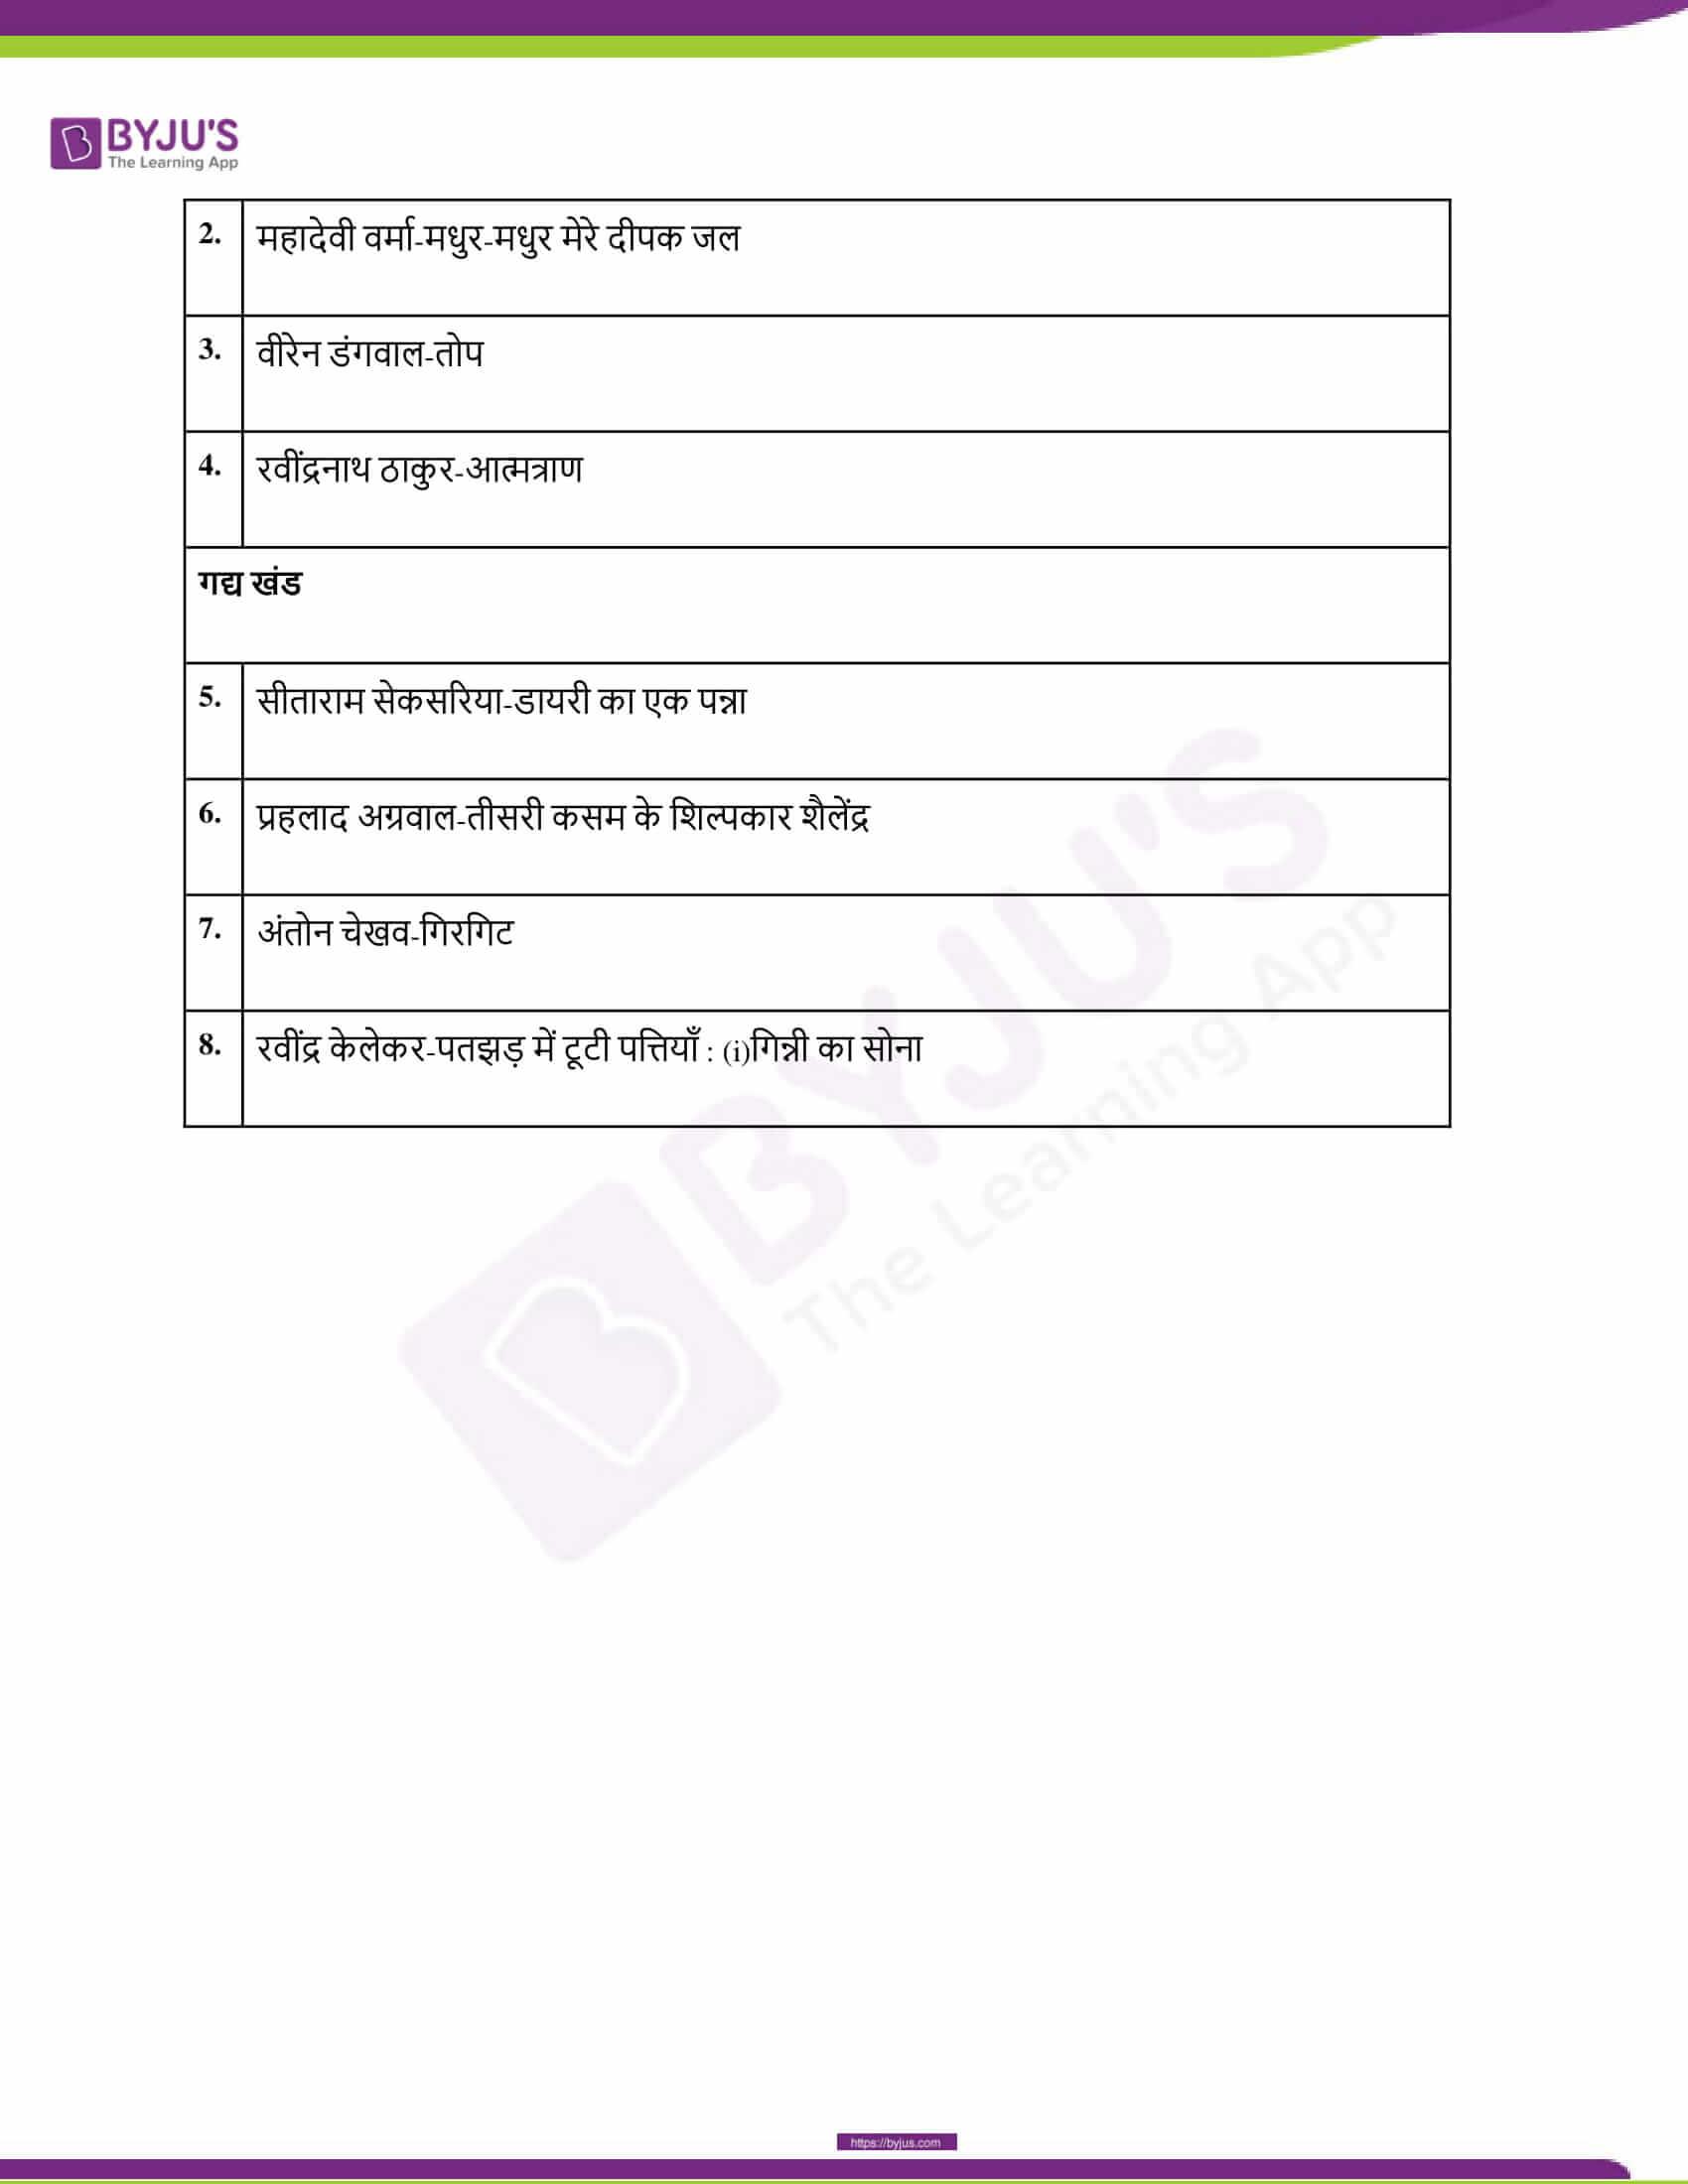 CBSE Class 10 Hindi Course B Revised Syllabus 2020 21 15